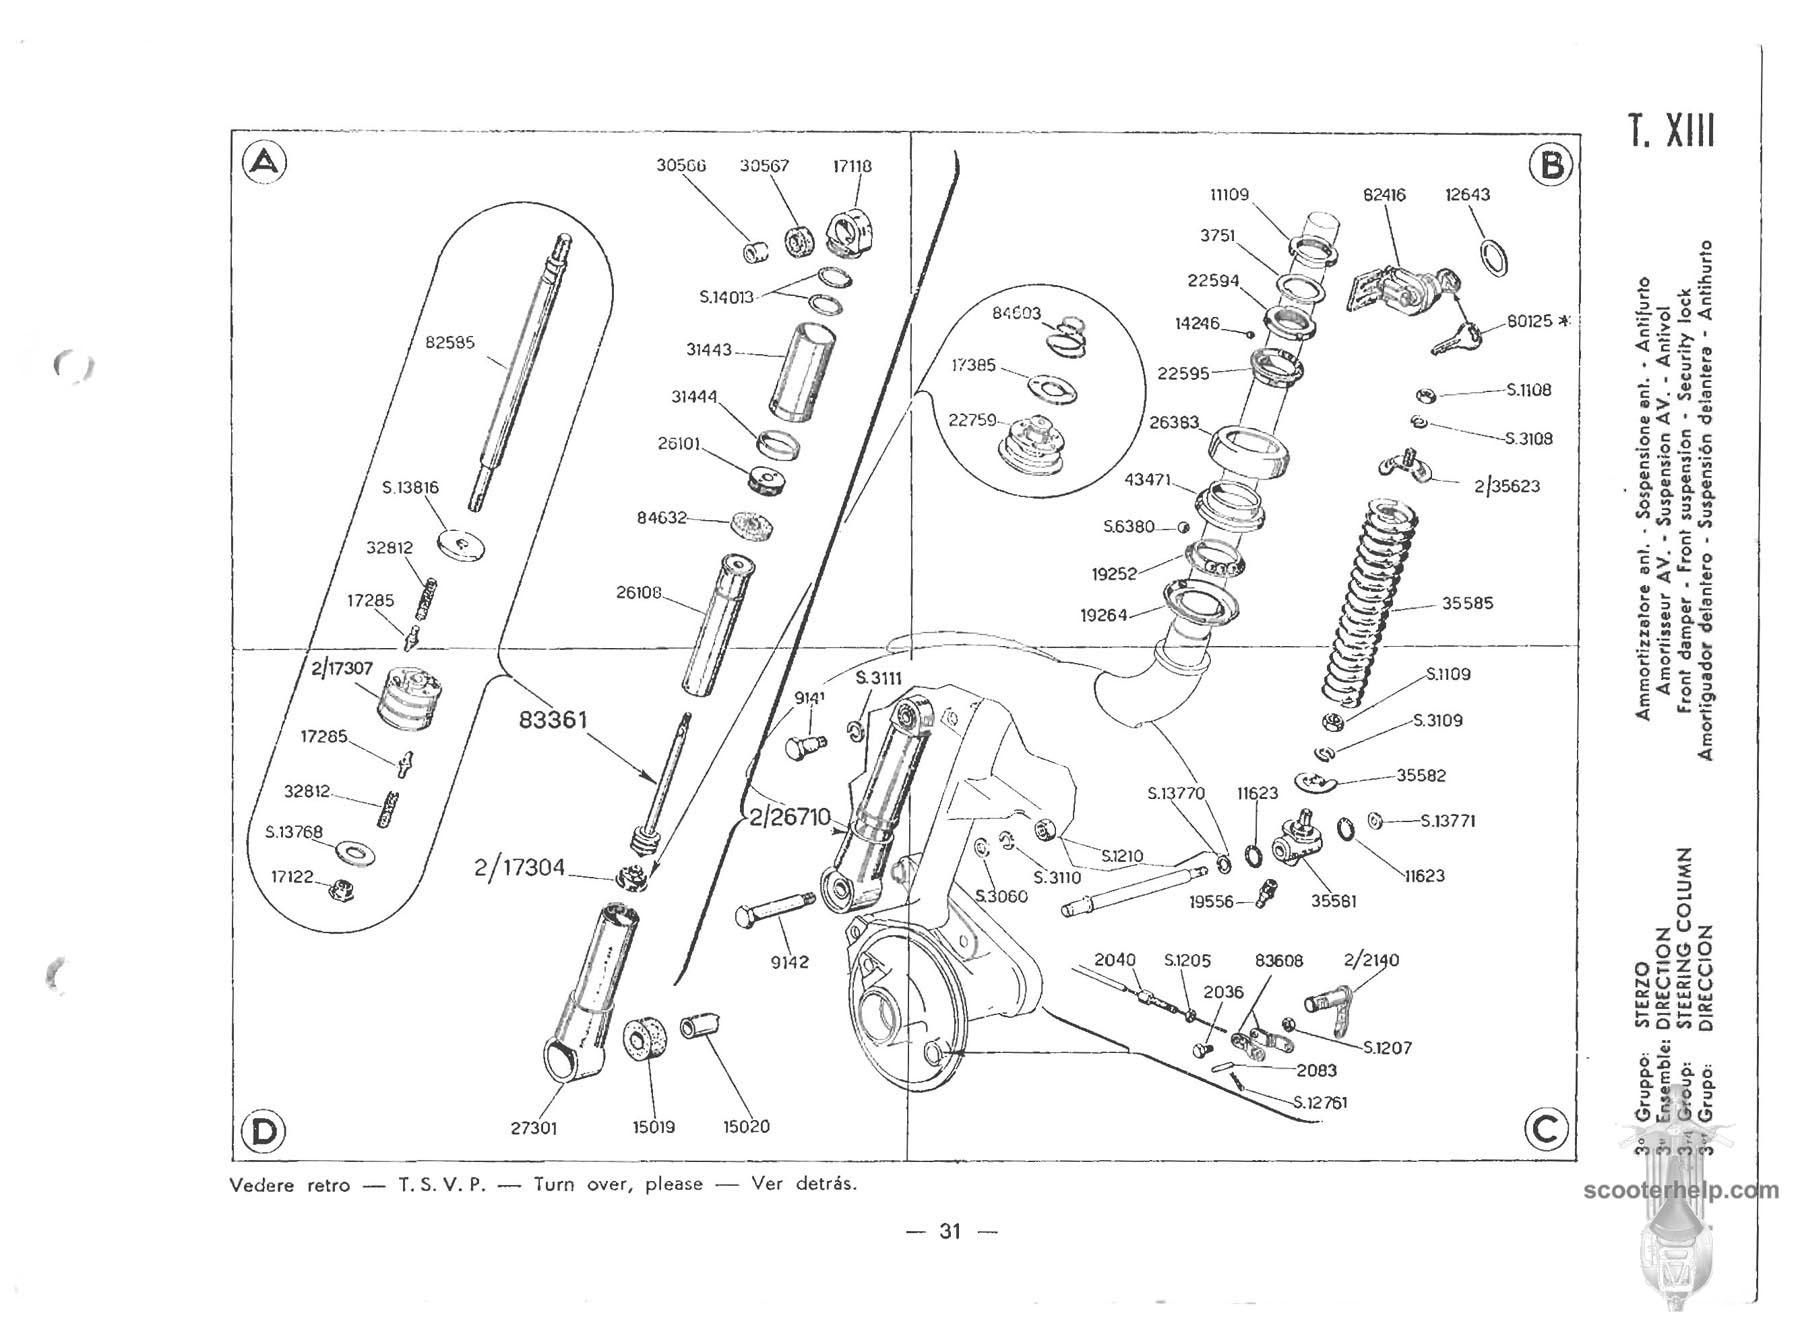 36 vespa 150 (vbb1t) parts manual,Vespa Sportique Wiring Diagram